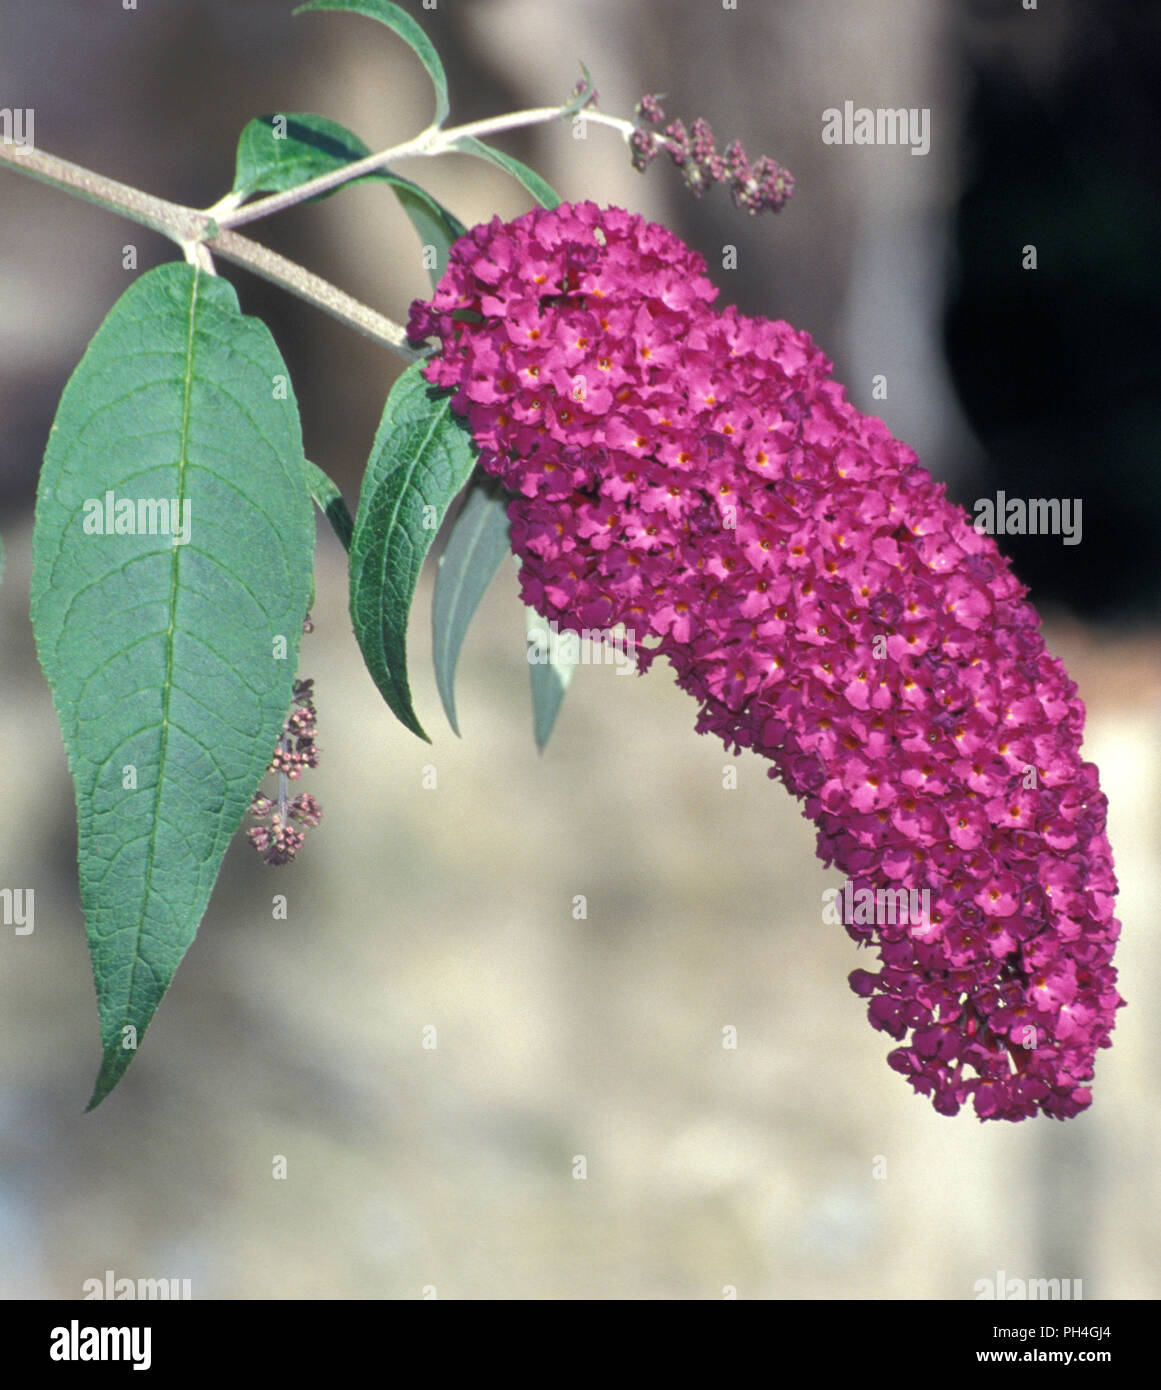 BUDDLEIA DAVIDII (BUTTERFLY BUSH OR SUMMER LILAC) - Stock Image